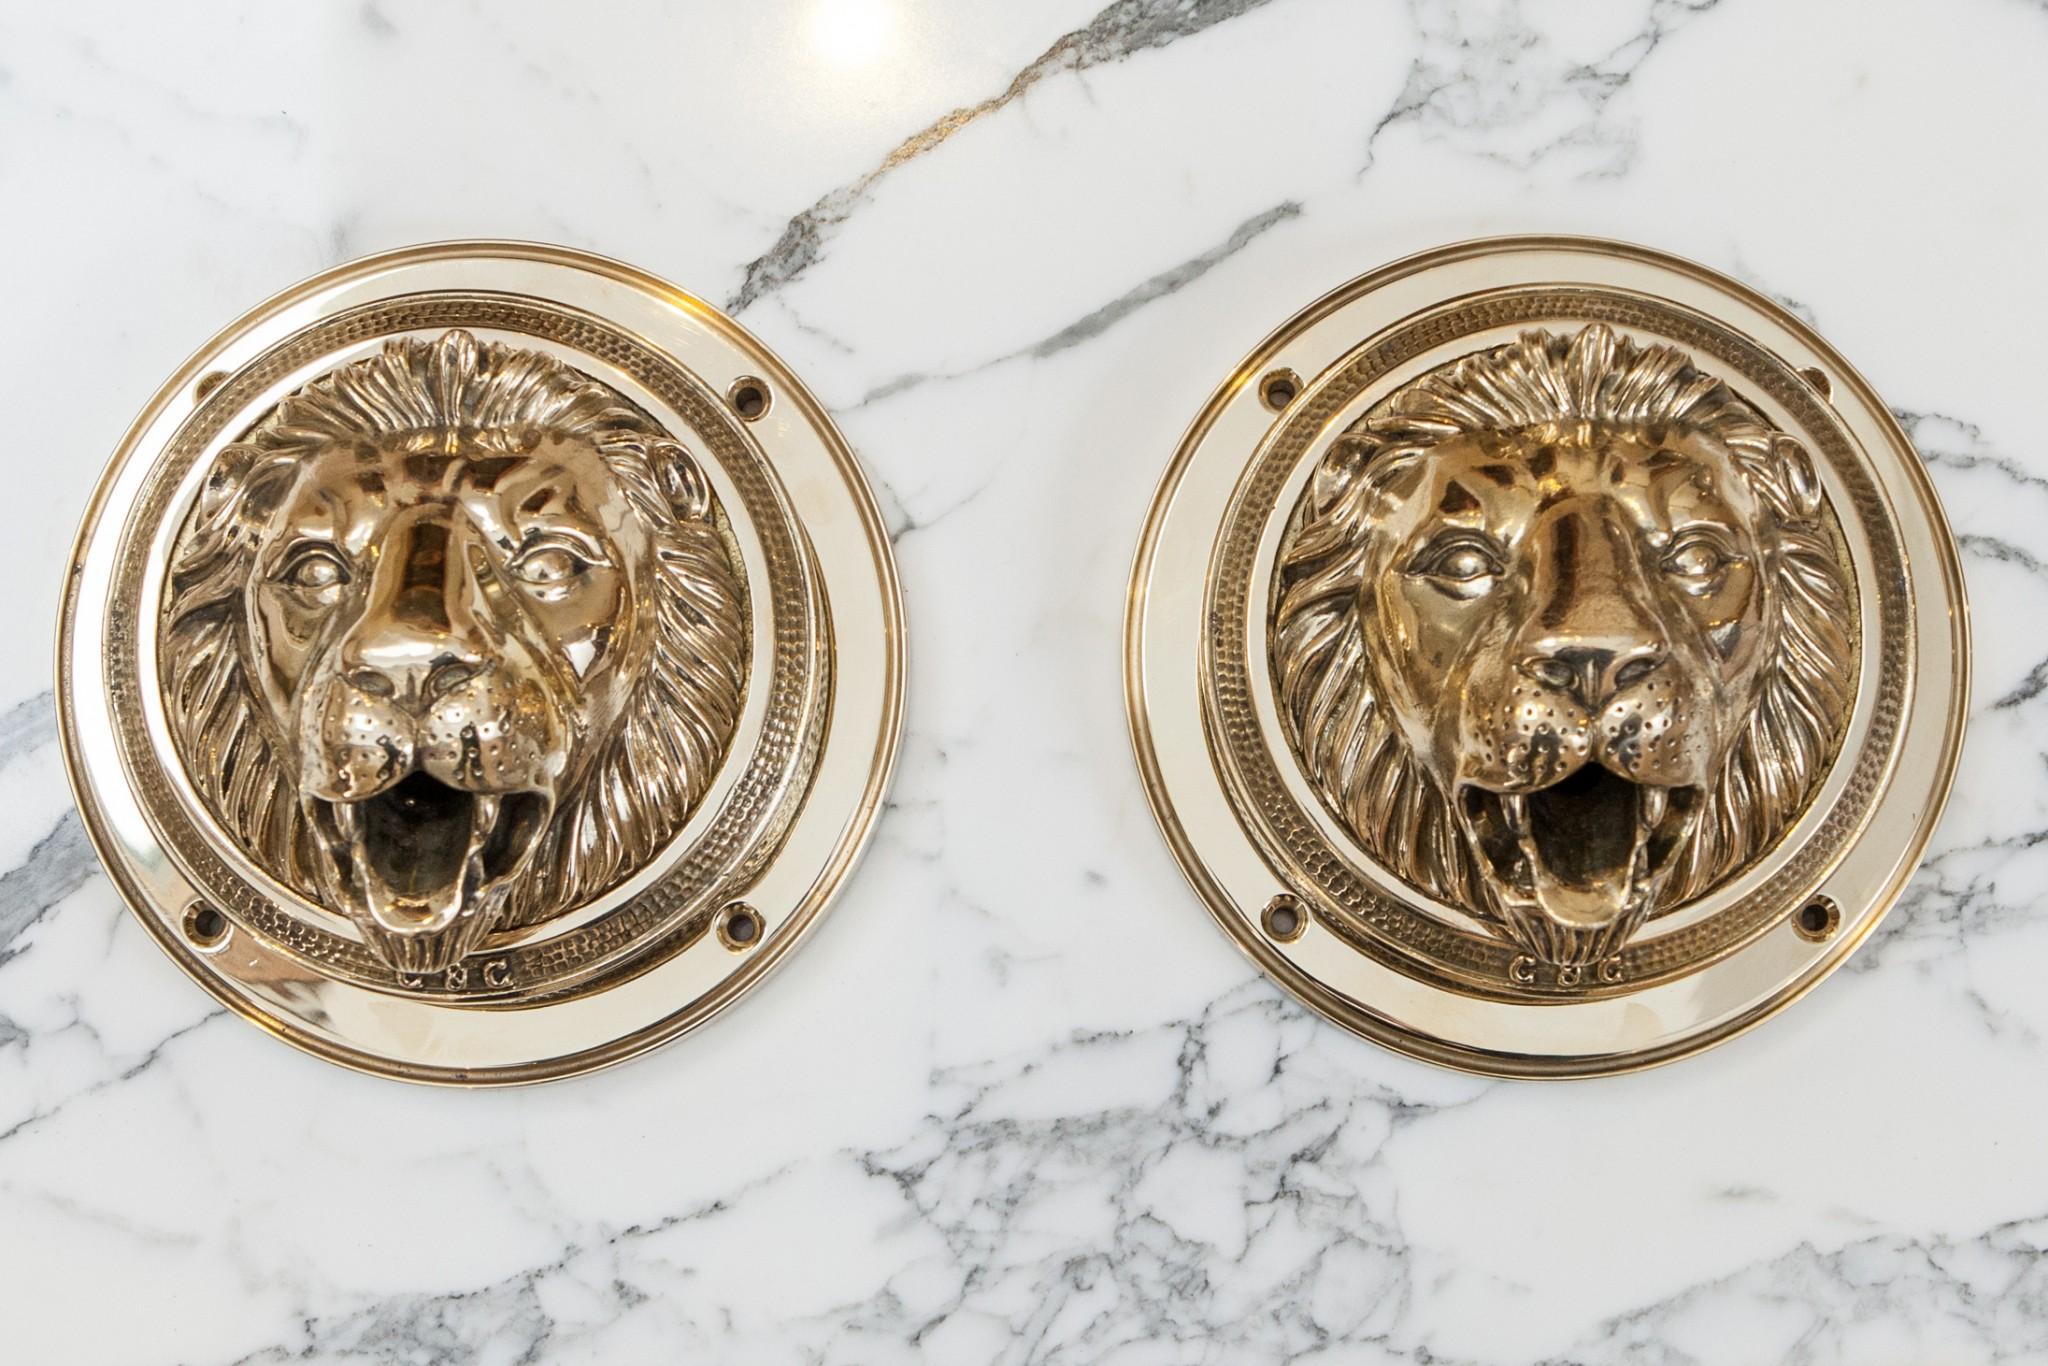 Brass bathroom fittings - Brass Bathroom Fittings